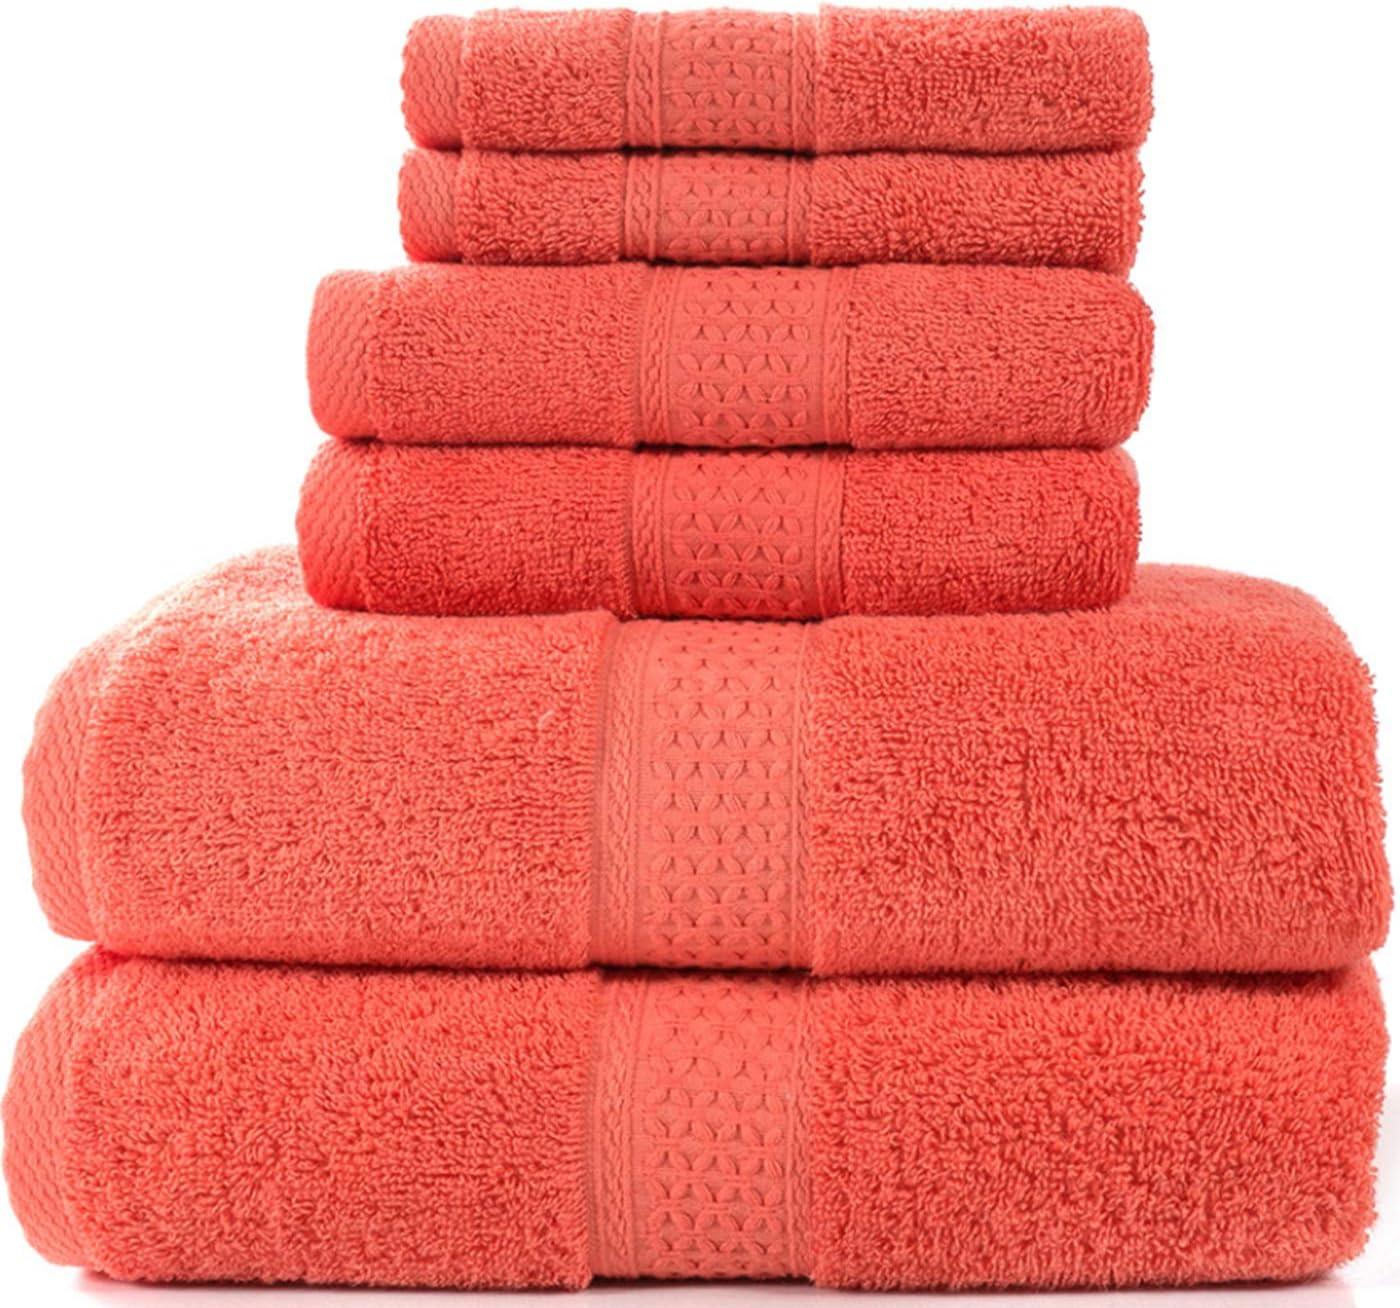 XNN 100% Cotton Premium Luxury Spa Cheap SALE Start Towels Financial sales sale Hotel Sets Bathroom